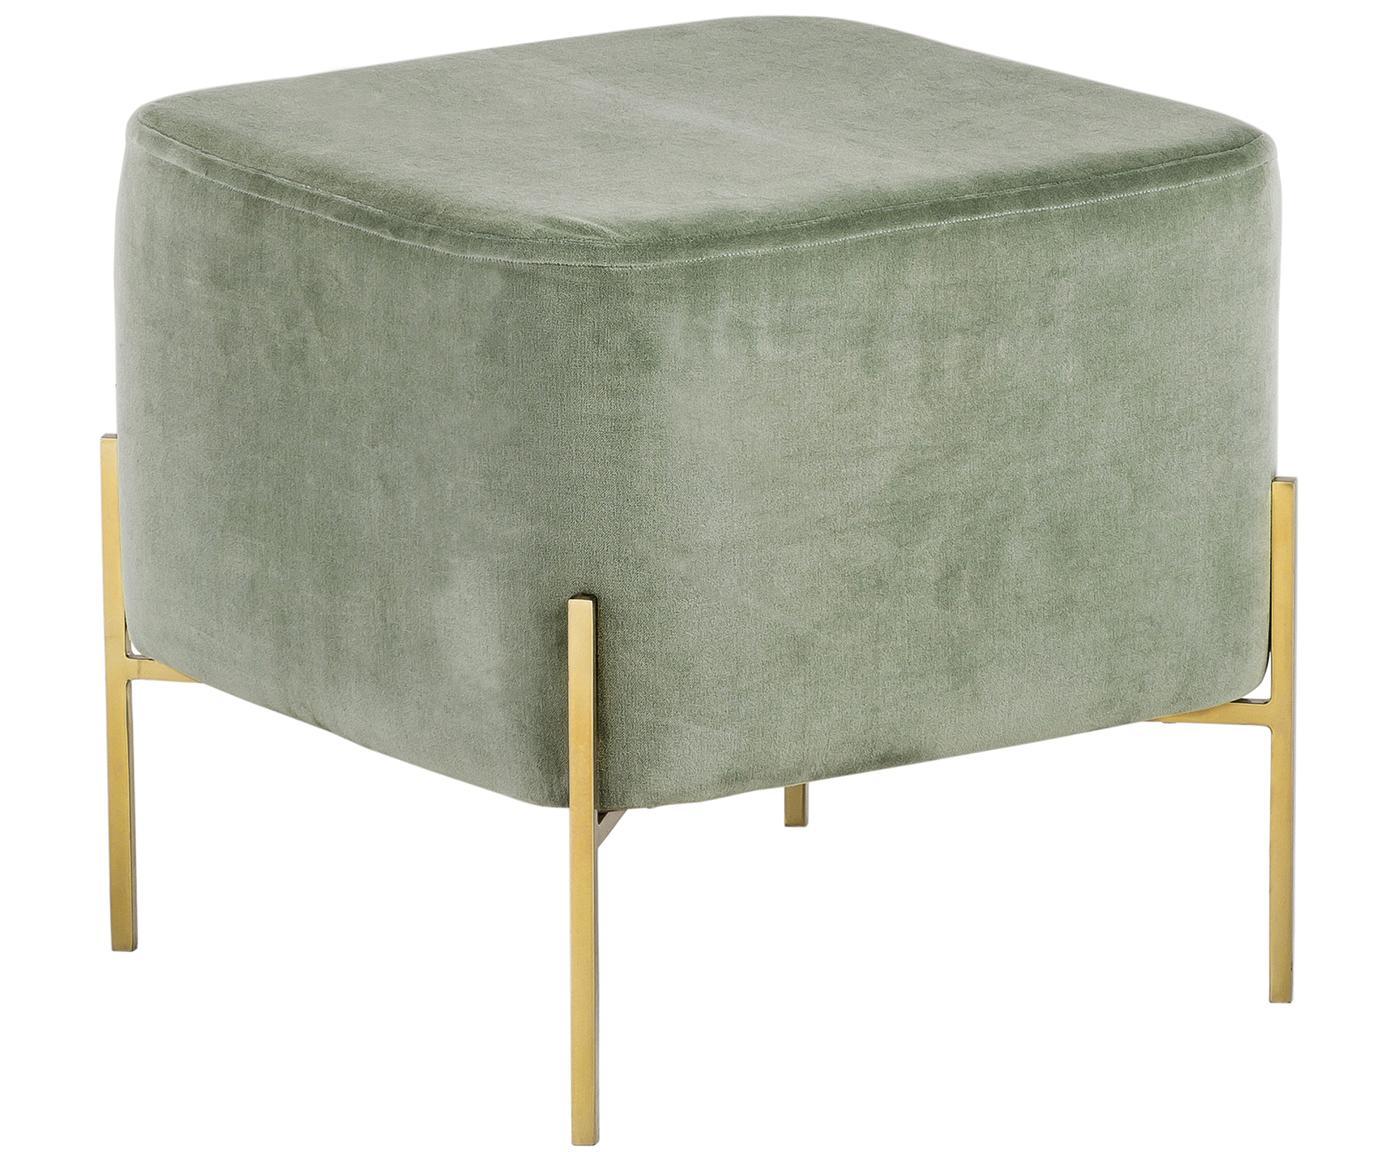 Pouf in velluto Harper, Rivestimento: velluto, Verde salvia, dorato, Larg. 46 x Alt. 44 cm